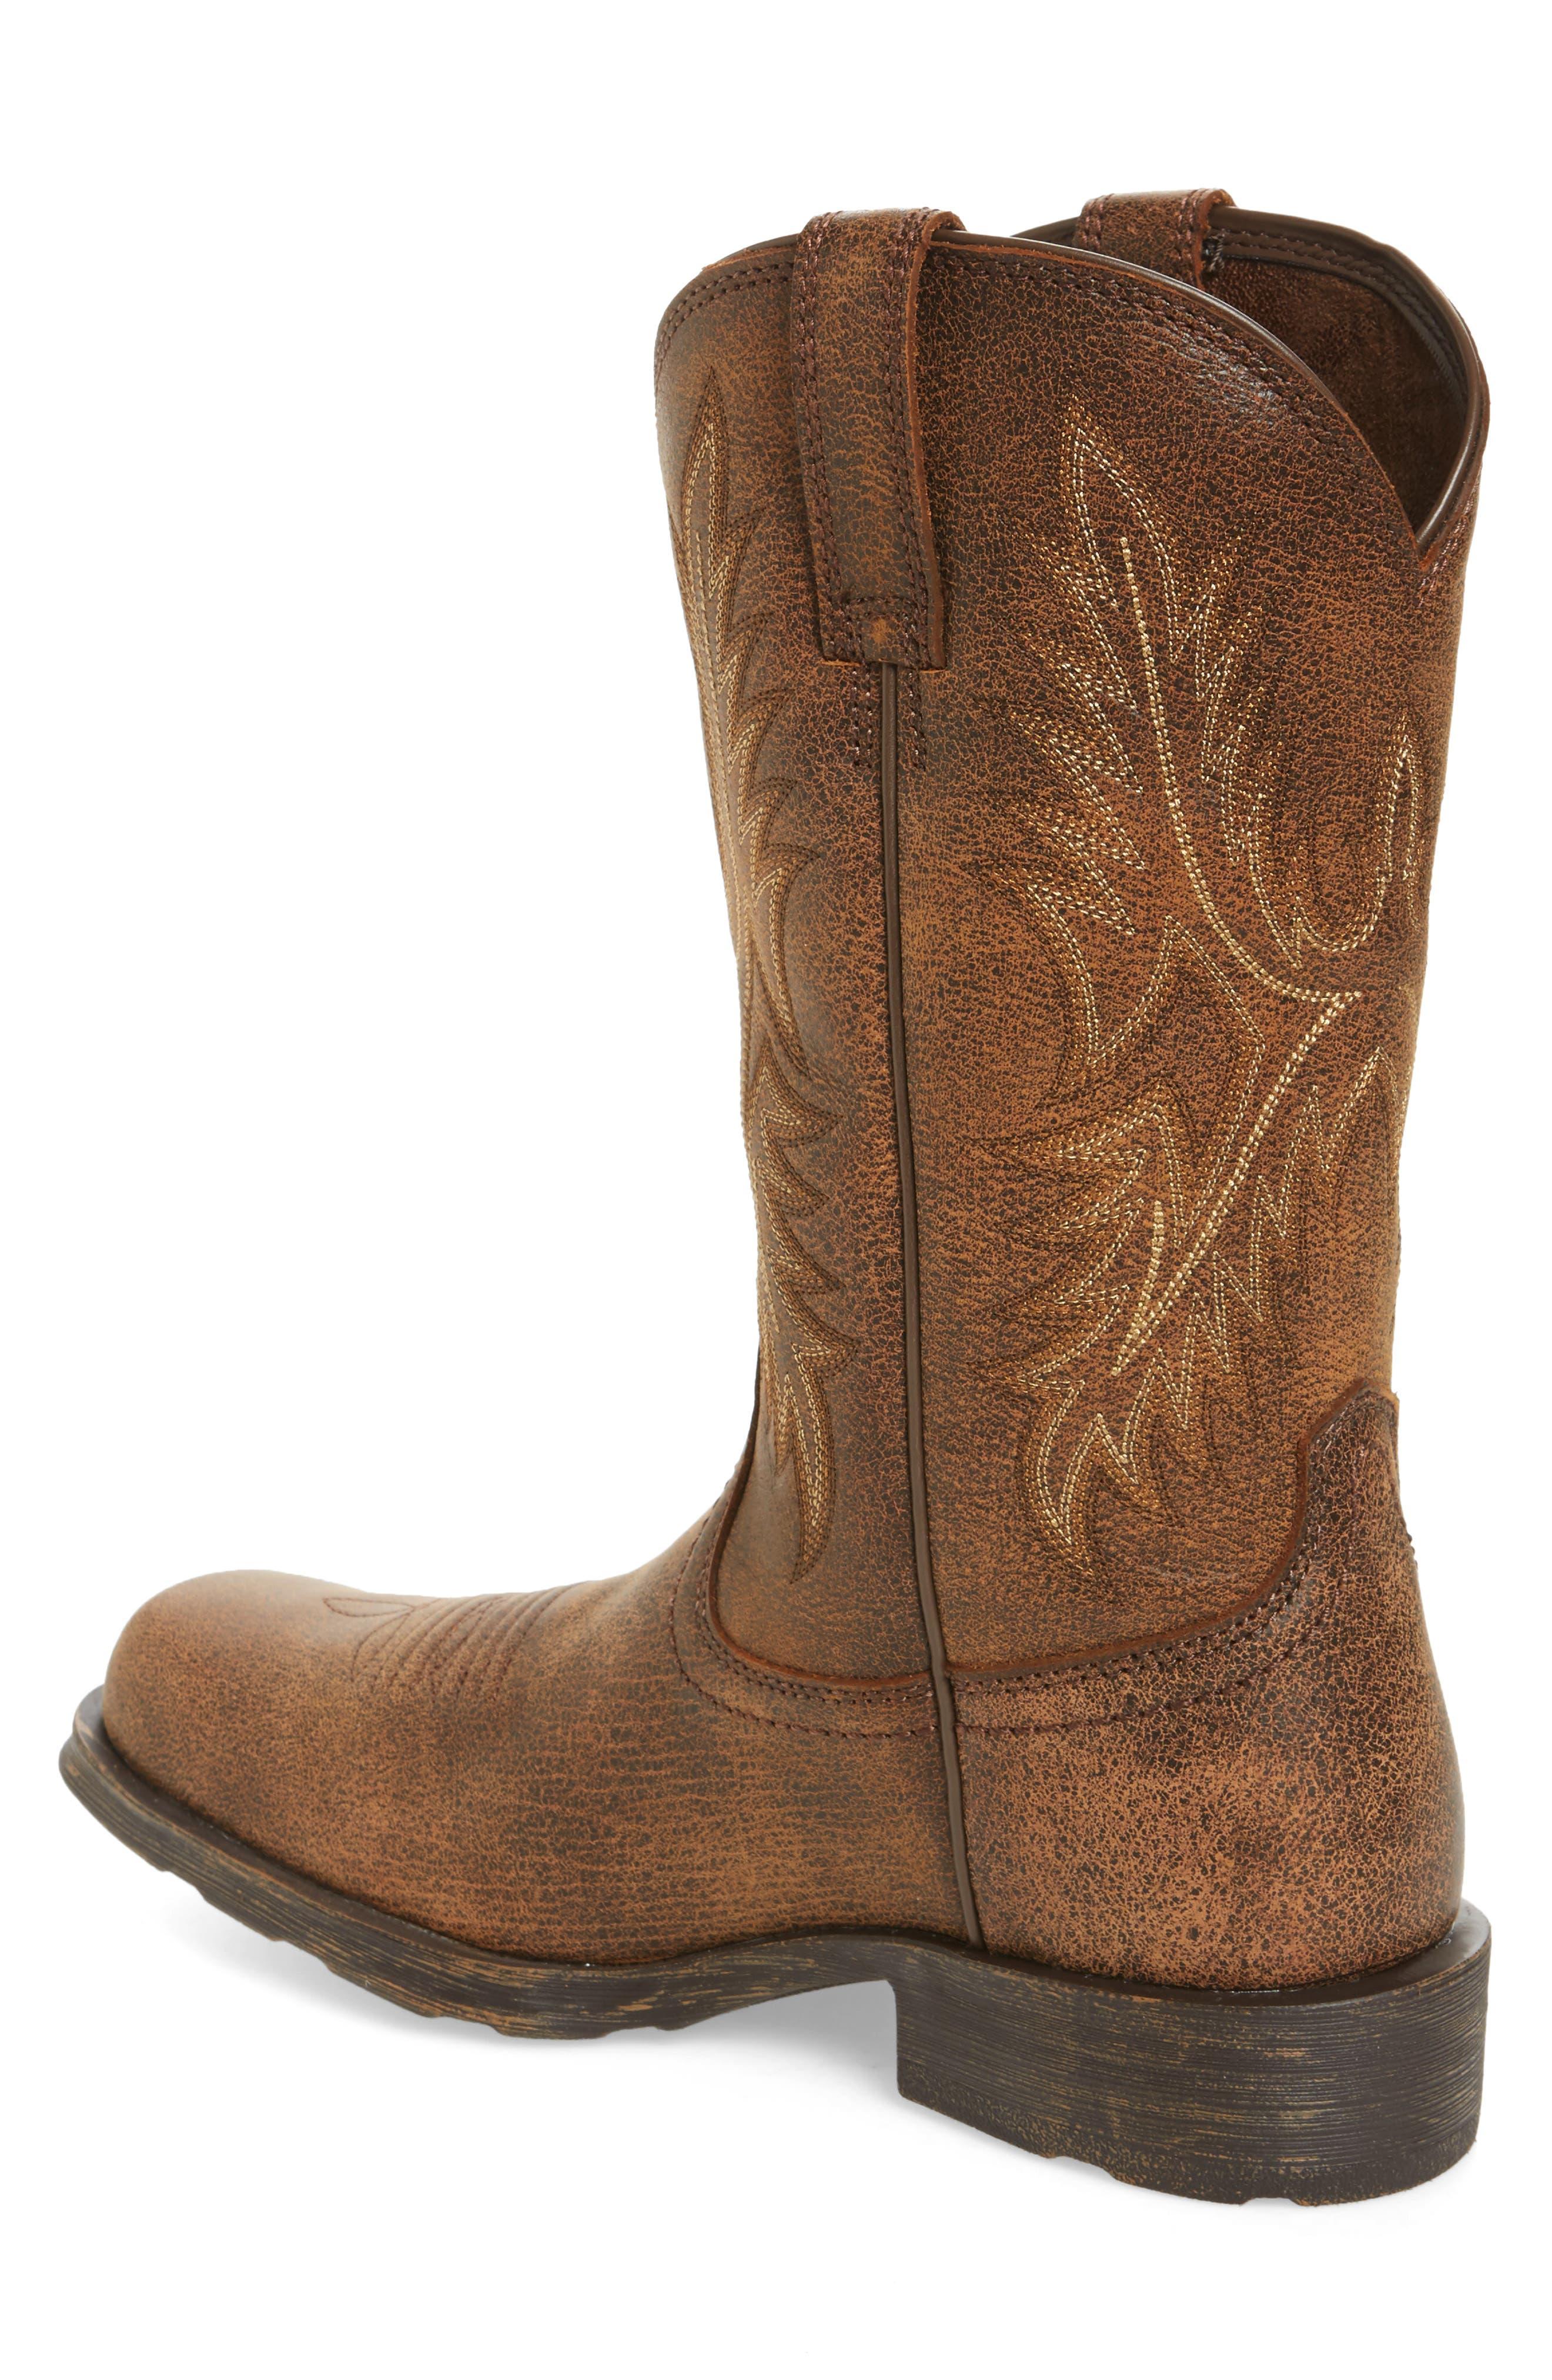 Western Rambler Cowboy Boot,                             Alternate thumbnail 2, color,                             Vintage Bomber Leather